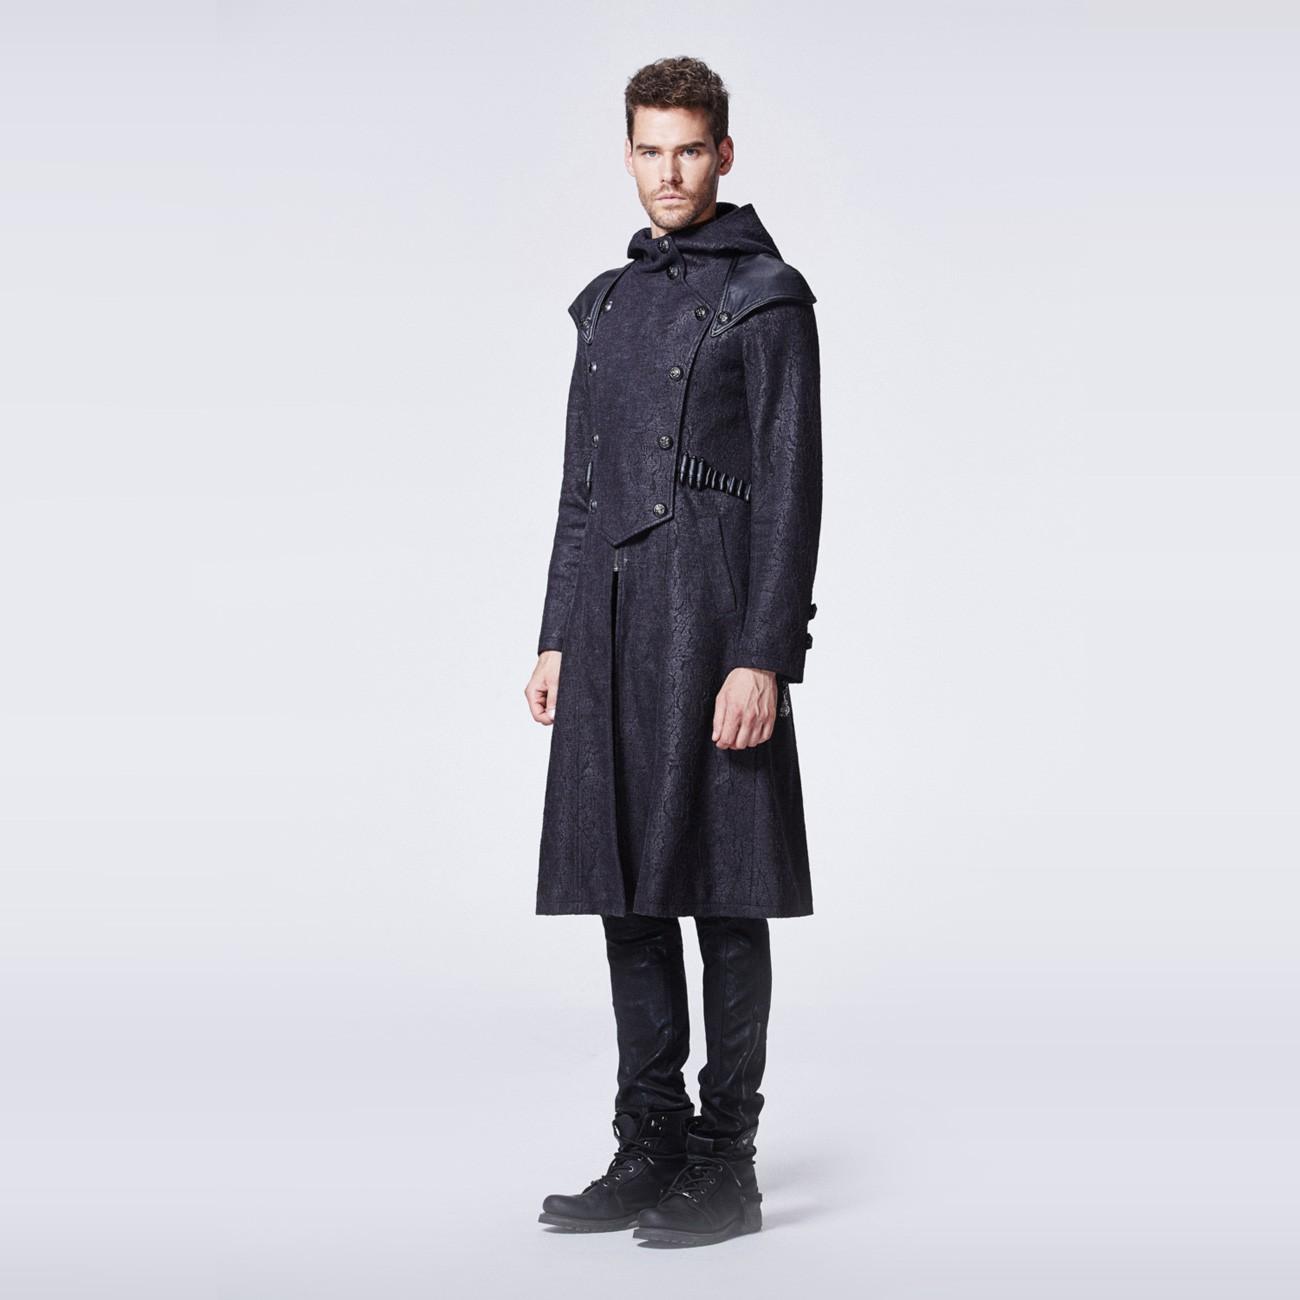 Schwarzer assassinen mantel mit kapuze for Schwarzer langer mantel